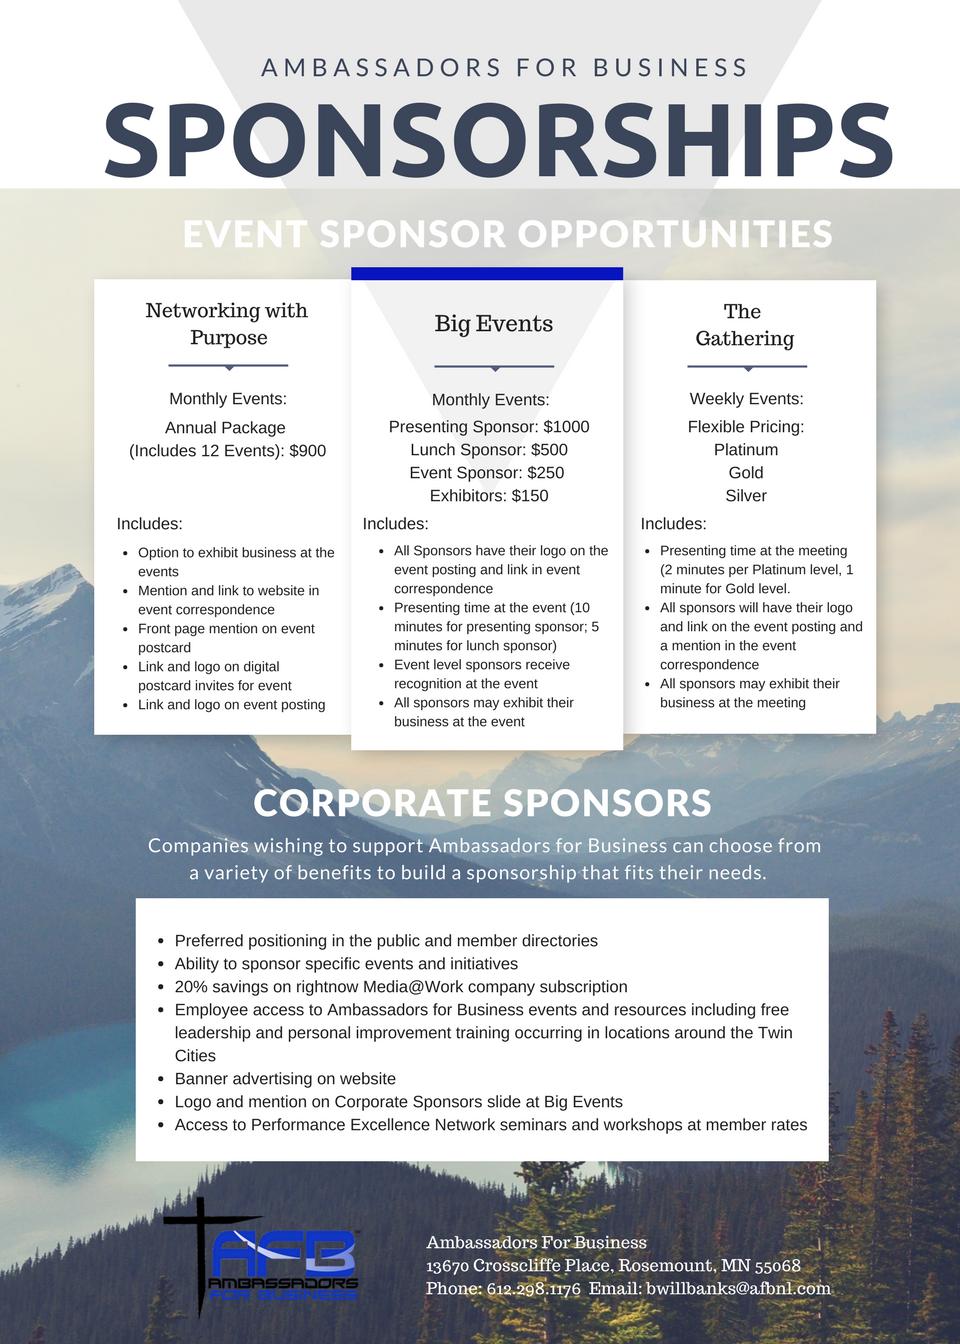 Sponsors benefits infographic